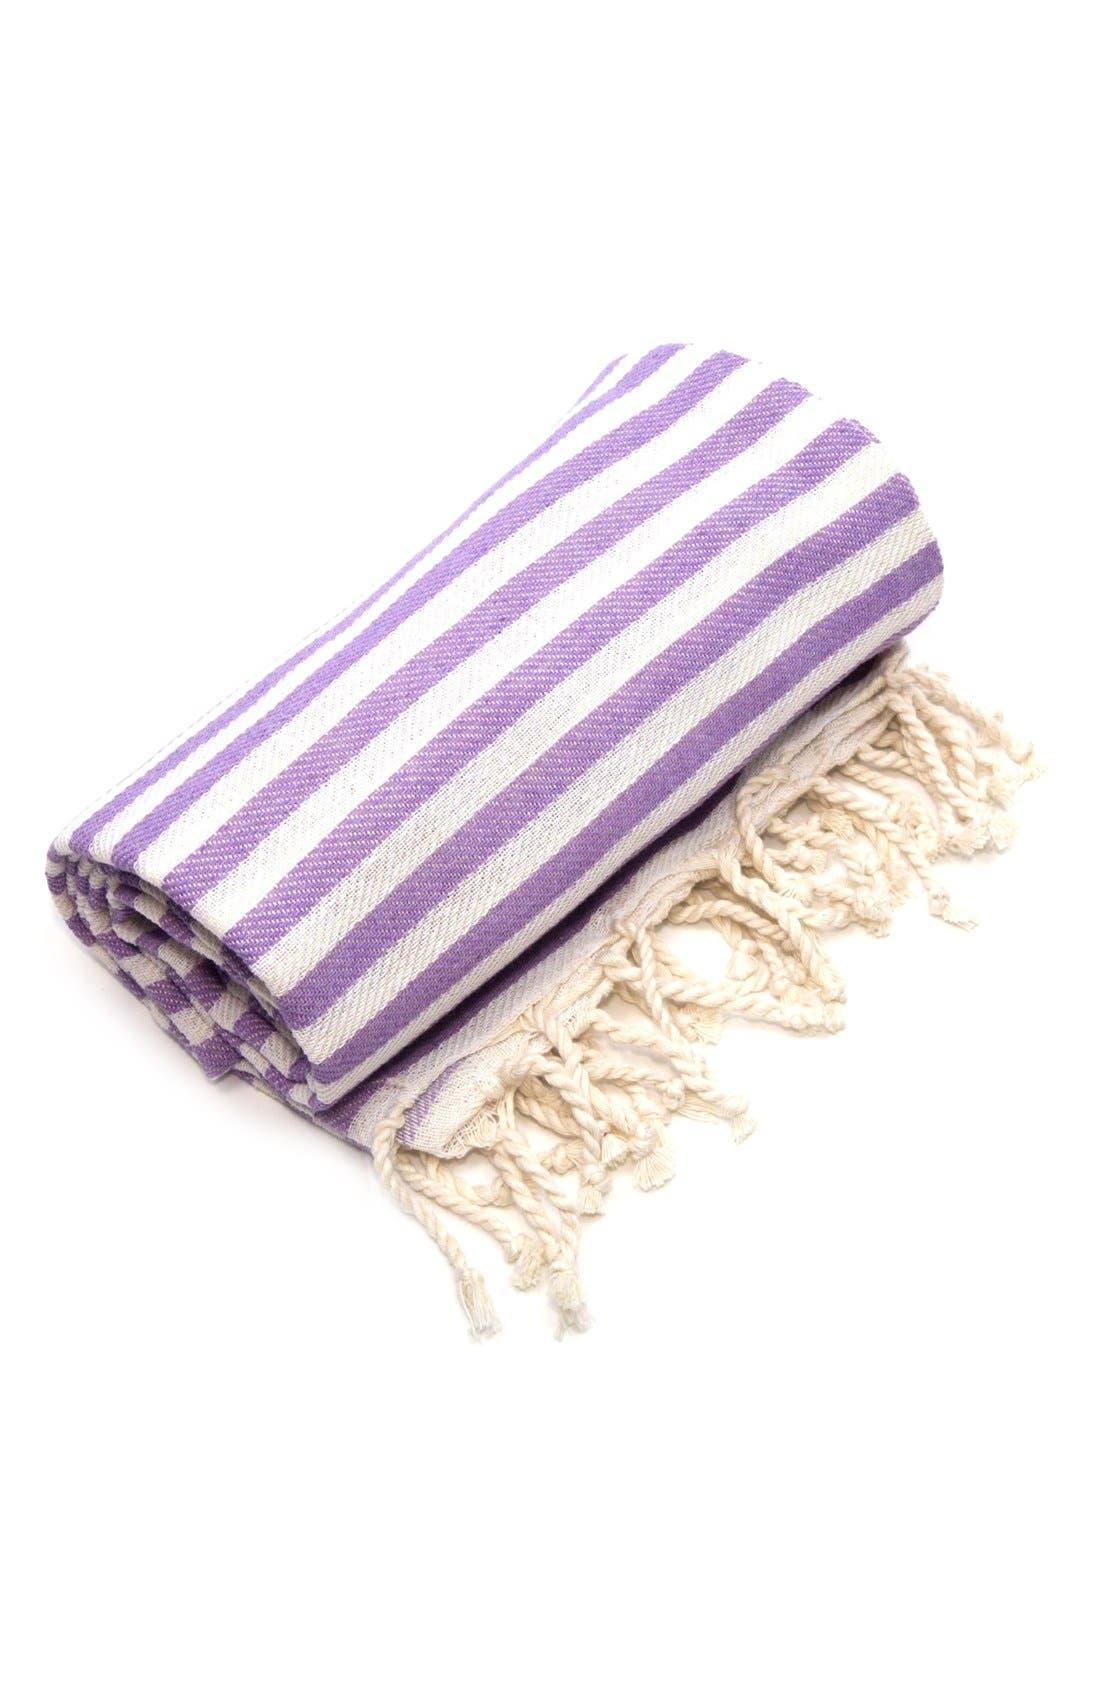 'Fun in the Sun' Turkish Pestemal Towel,                             Alternate thumbnail 2, color,                             Lilac